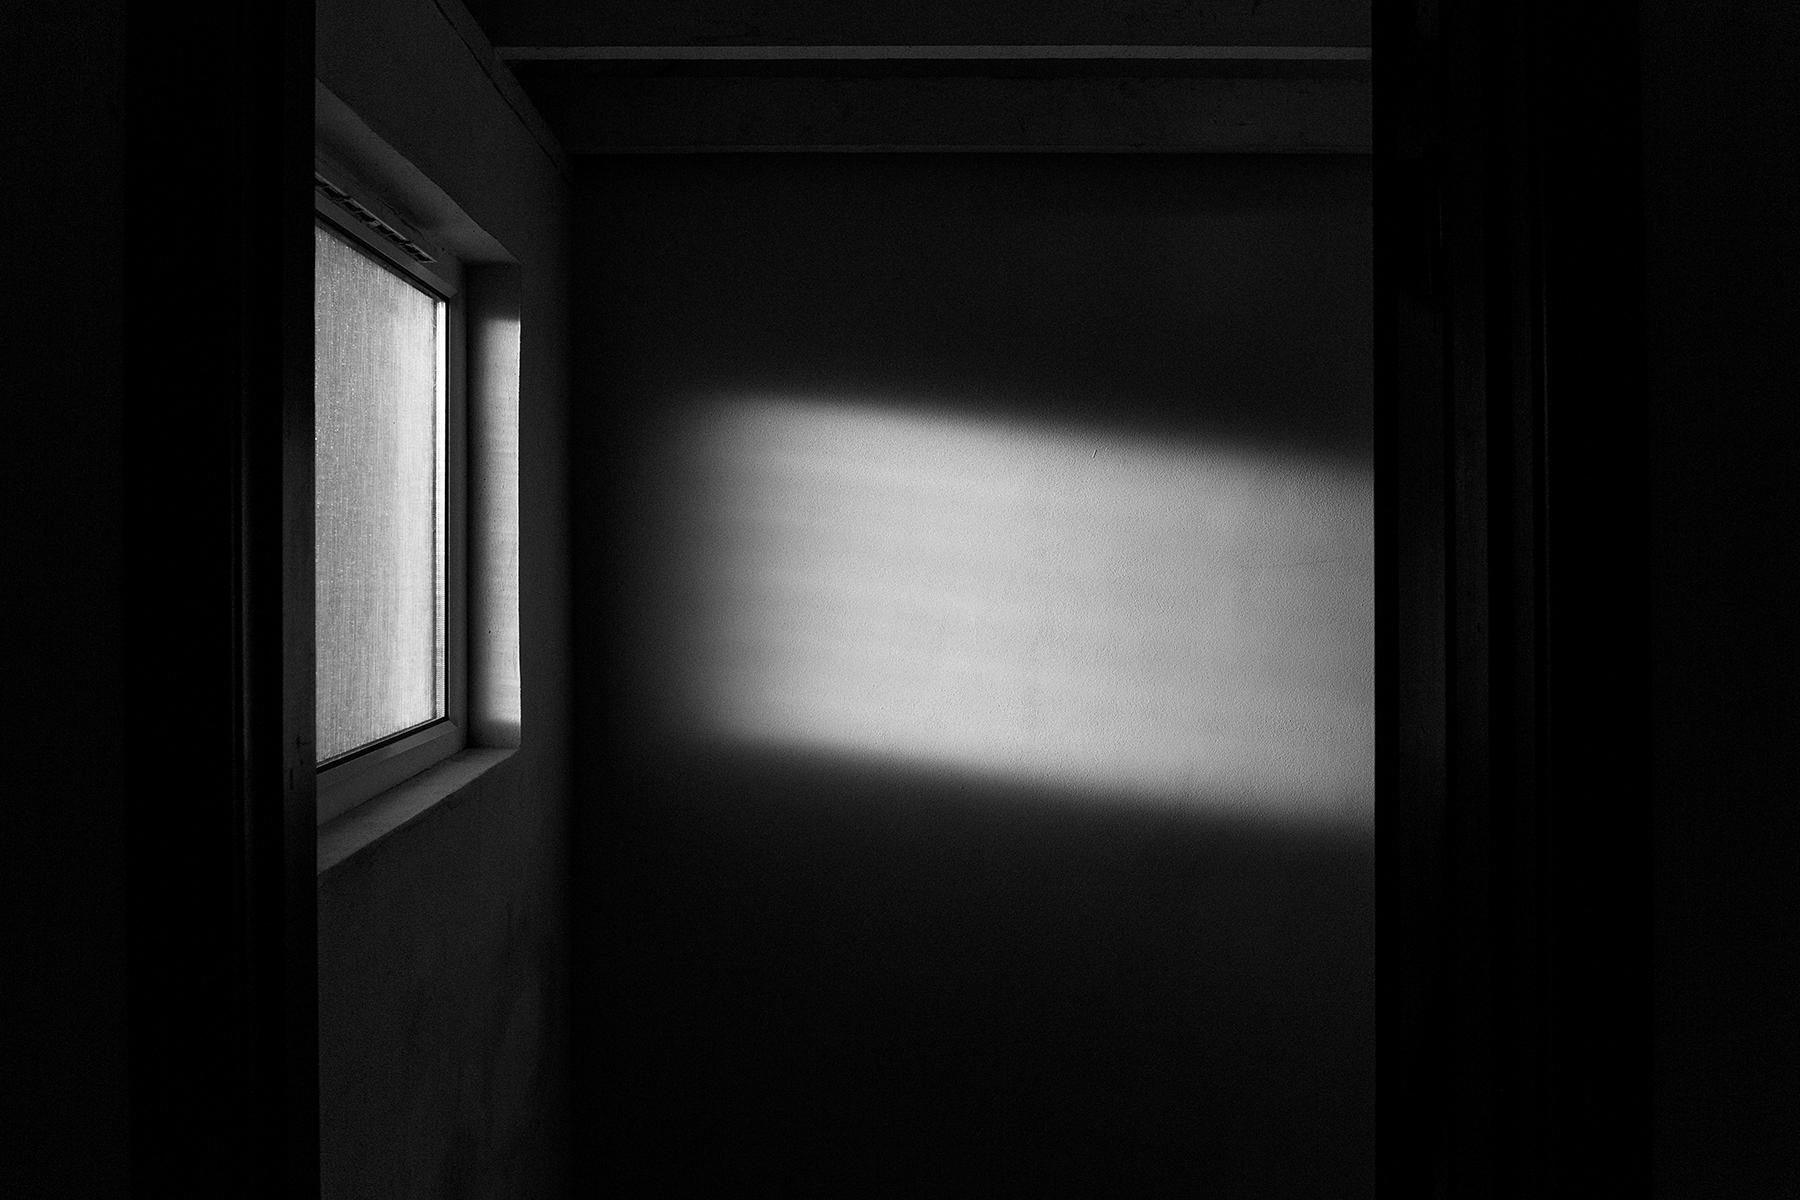 Bathroom_Light.jpg